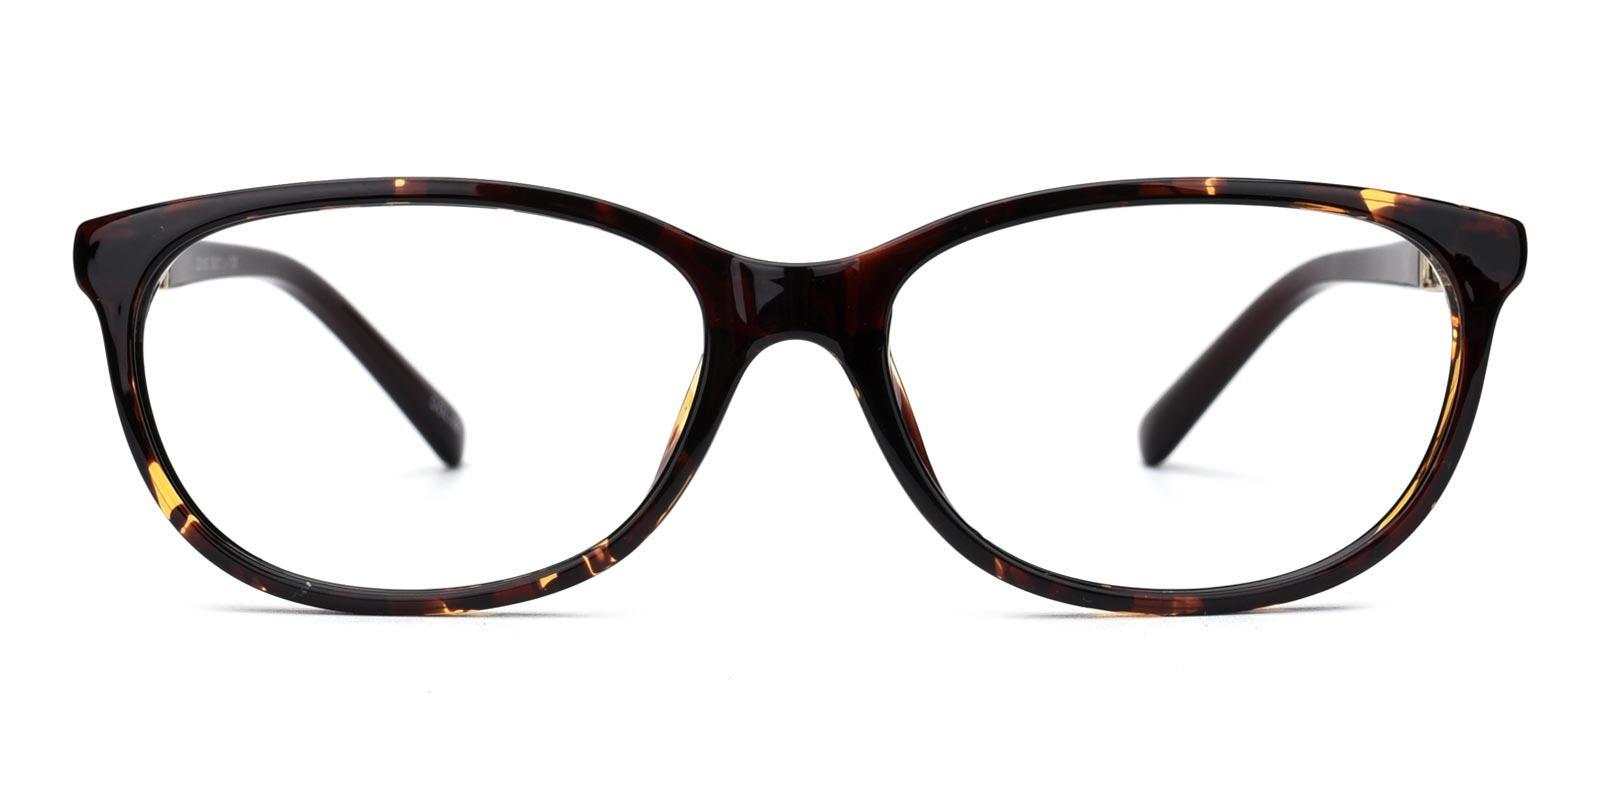 Hilary-Tortoise-Rectangle-TR-Eyeglasses-additional2